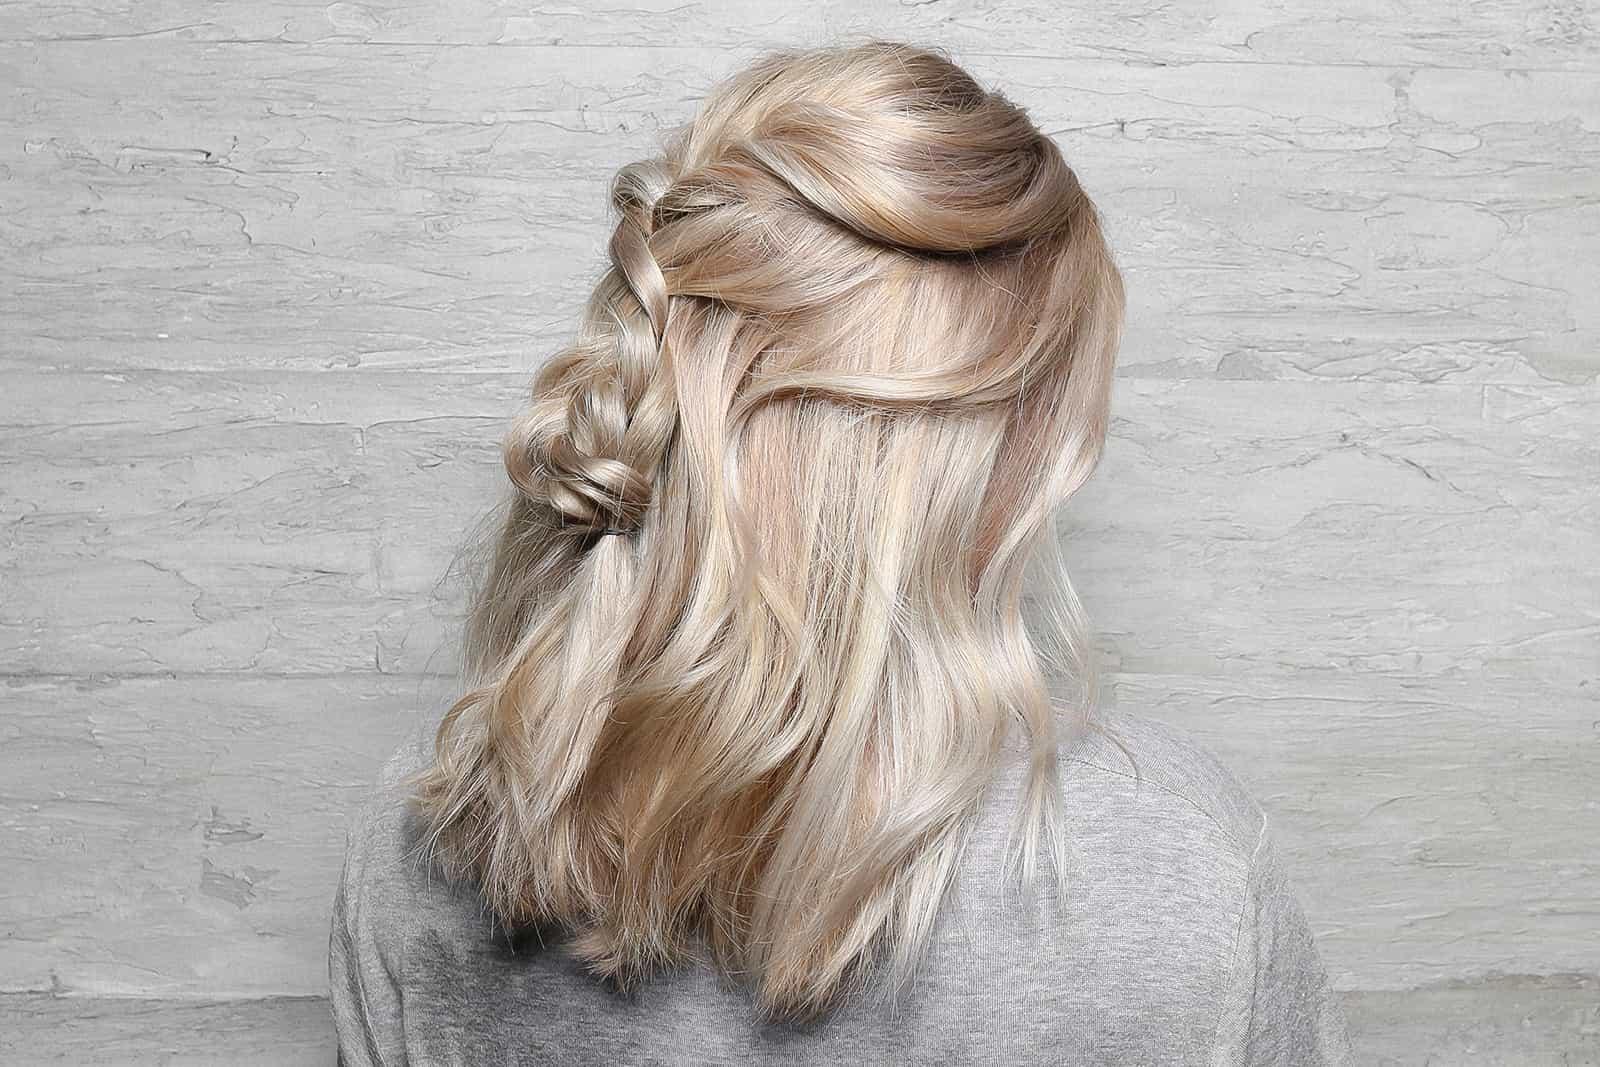 Balayage partial highlights ash blonde braid